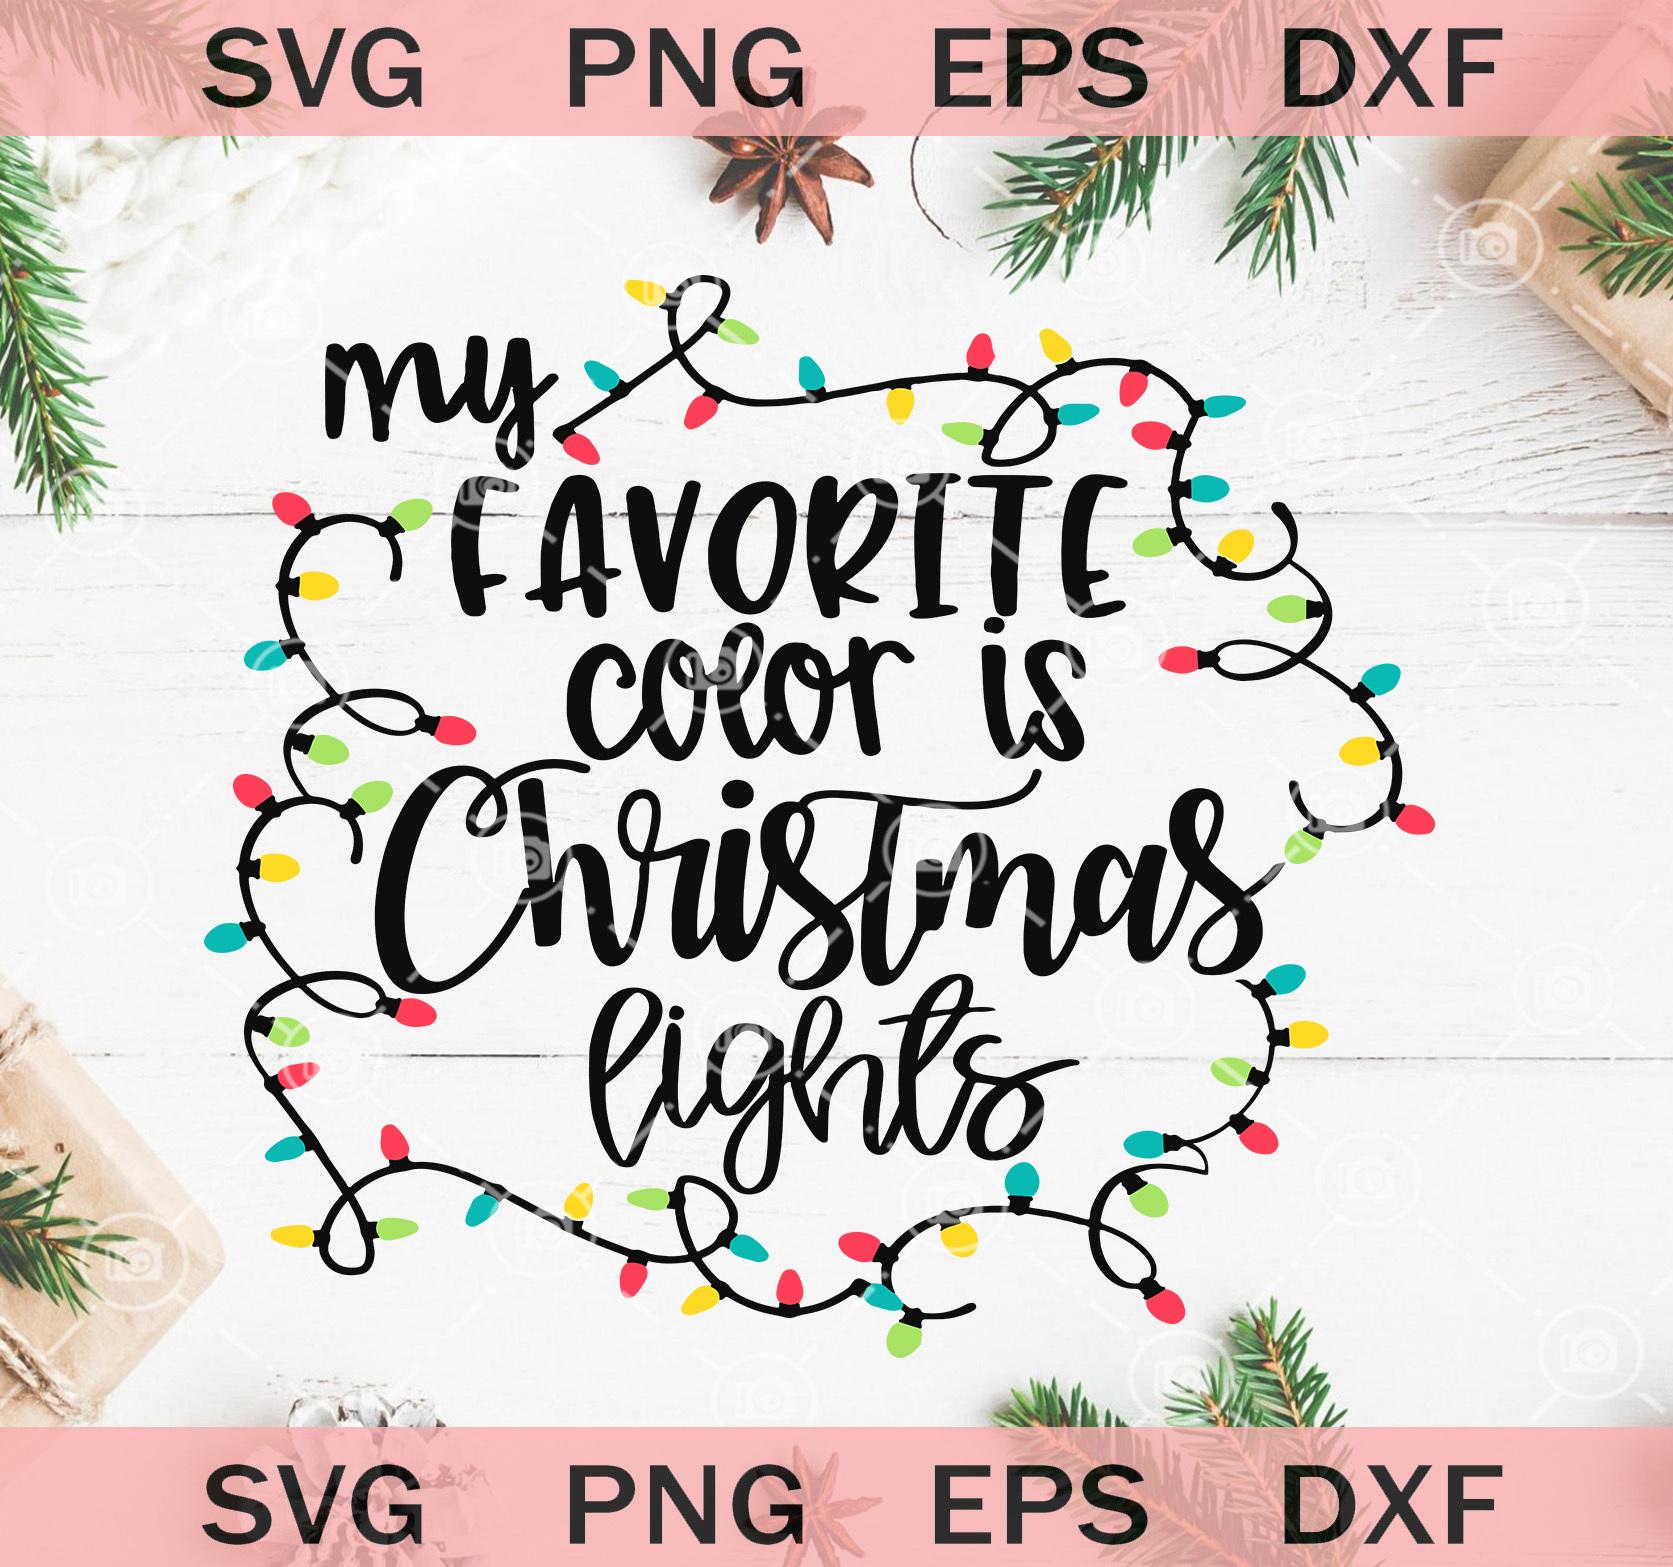 My Favorite Color Is Christmas Lights By Sunshinesvg Shop On Zibbet